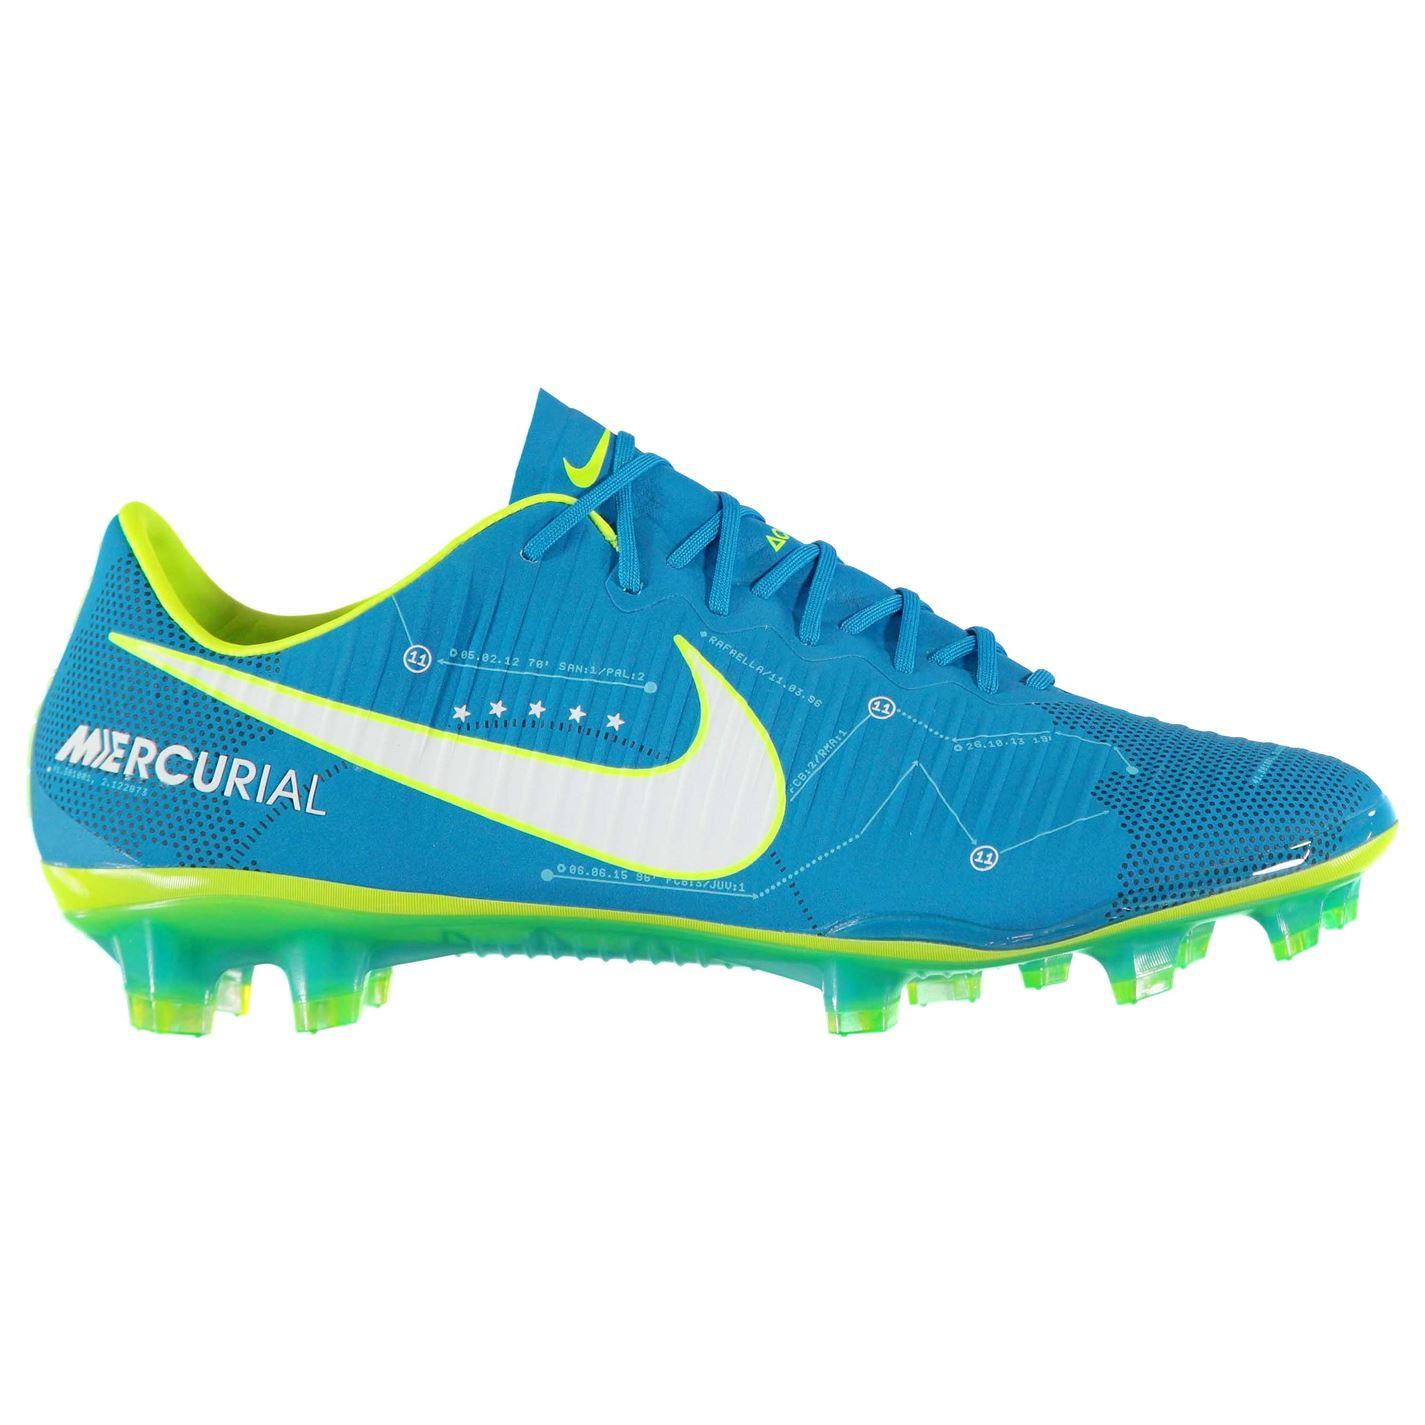 Nike Mercurial Vapor Neymar Jr FG Mens Football Boots